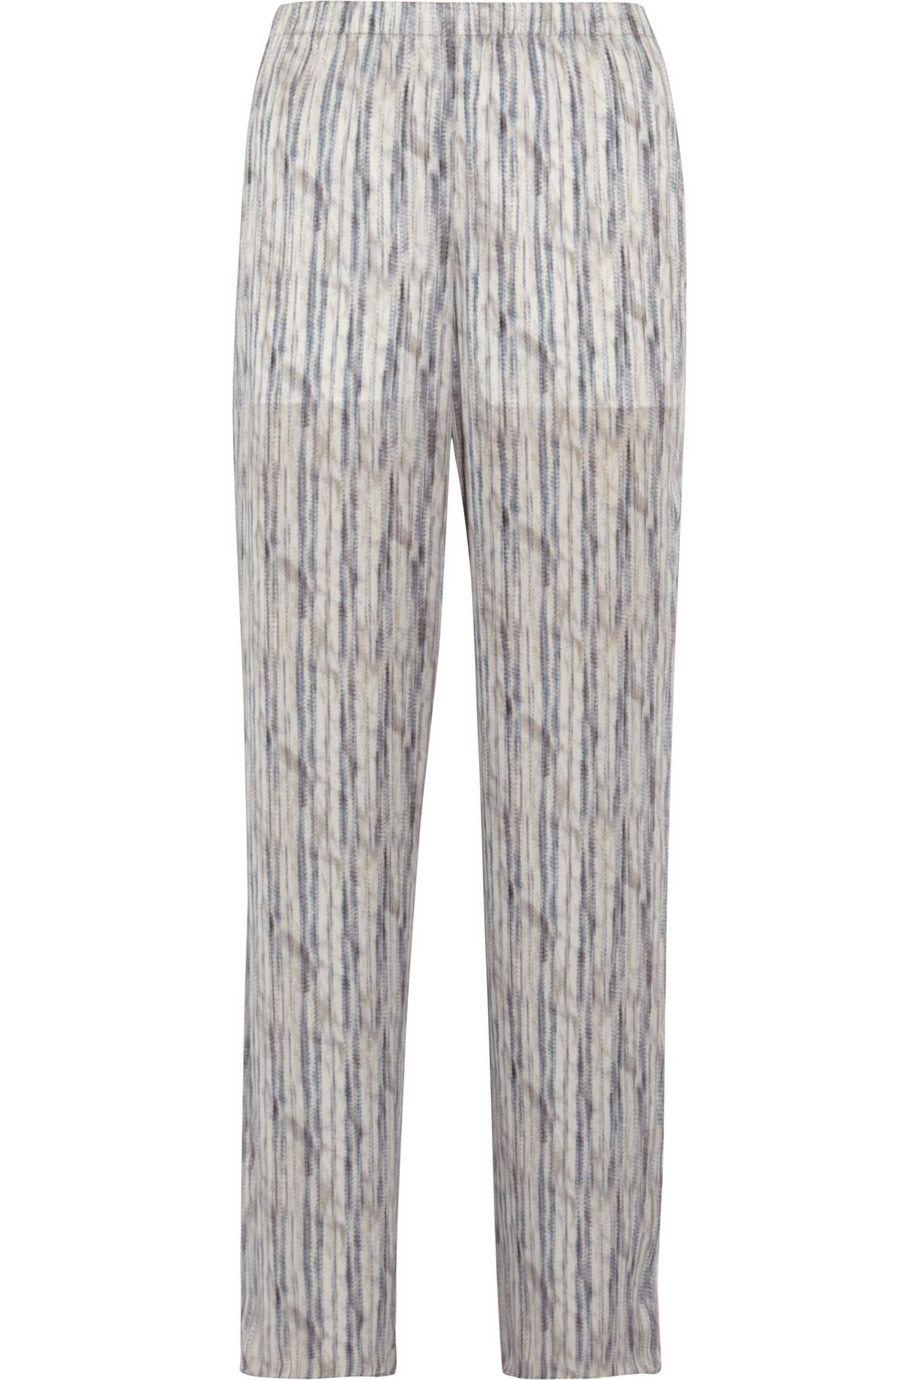 Theyskens' Theory|Printed silk wide-leg pants|NET-A-PORTER.COM